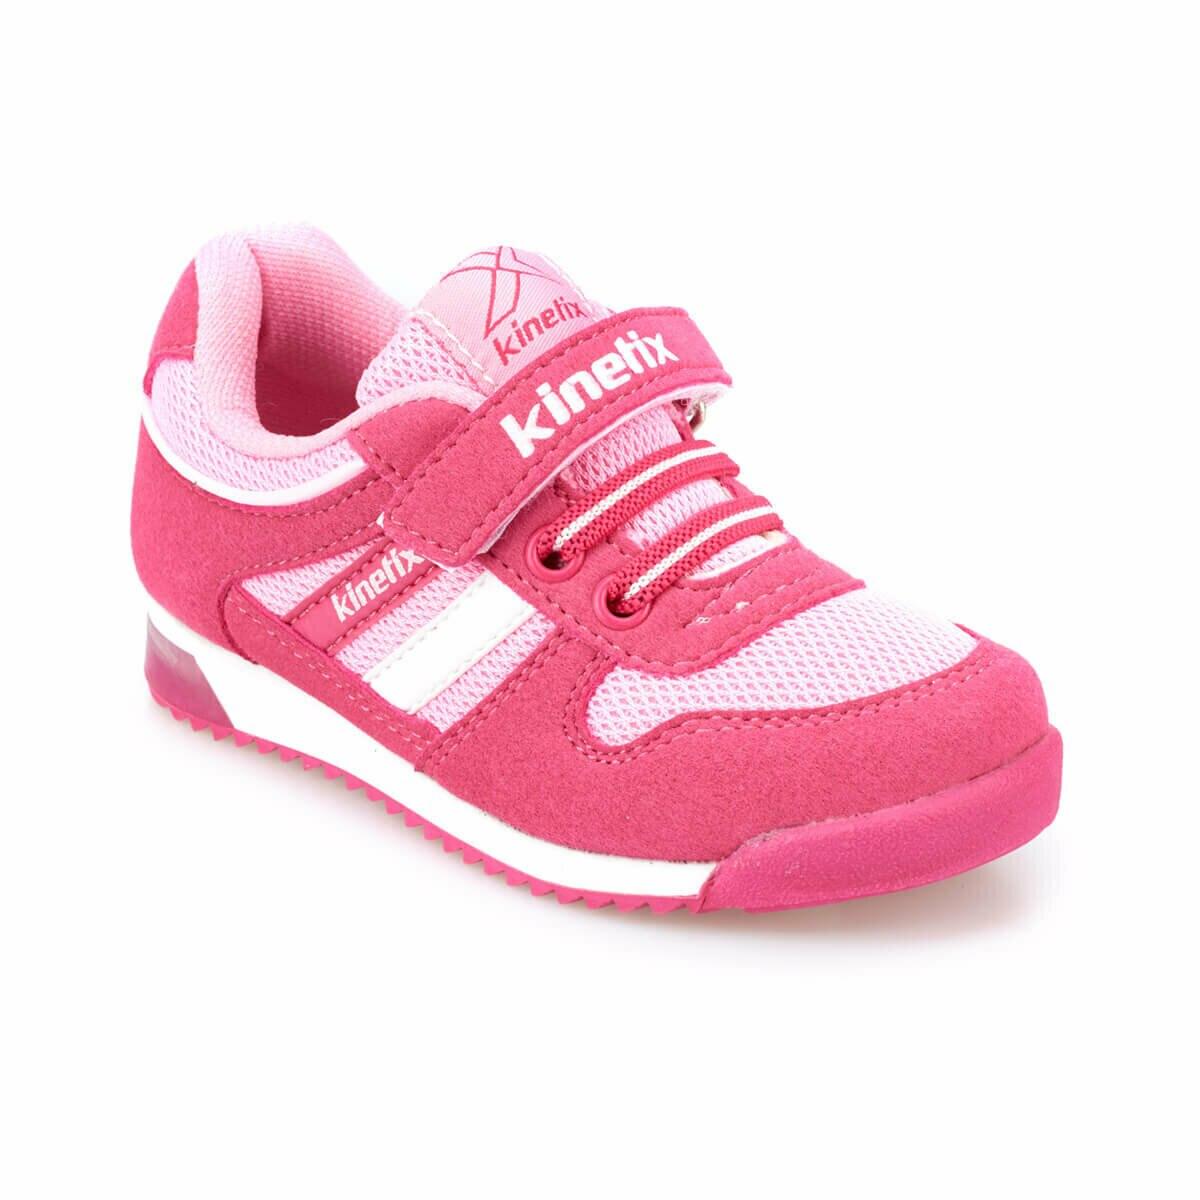 FLO FEMAND Fuchsia Female Child Sneaker Shoes KINETIX